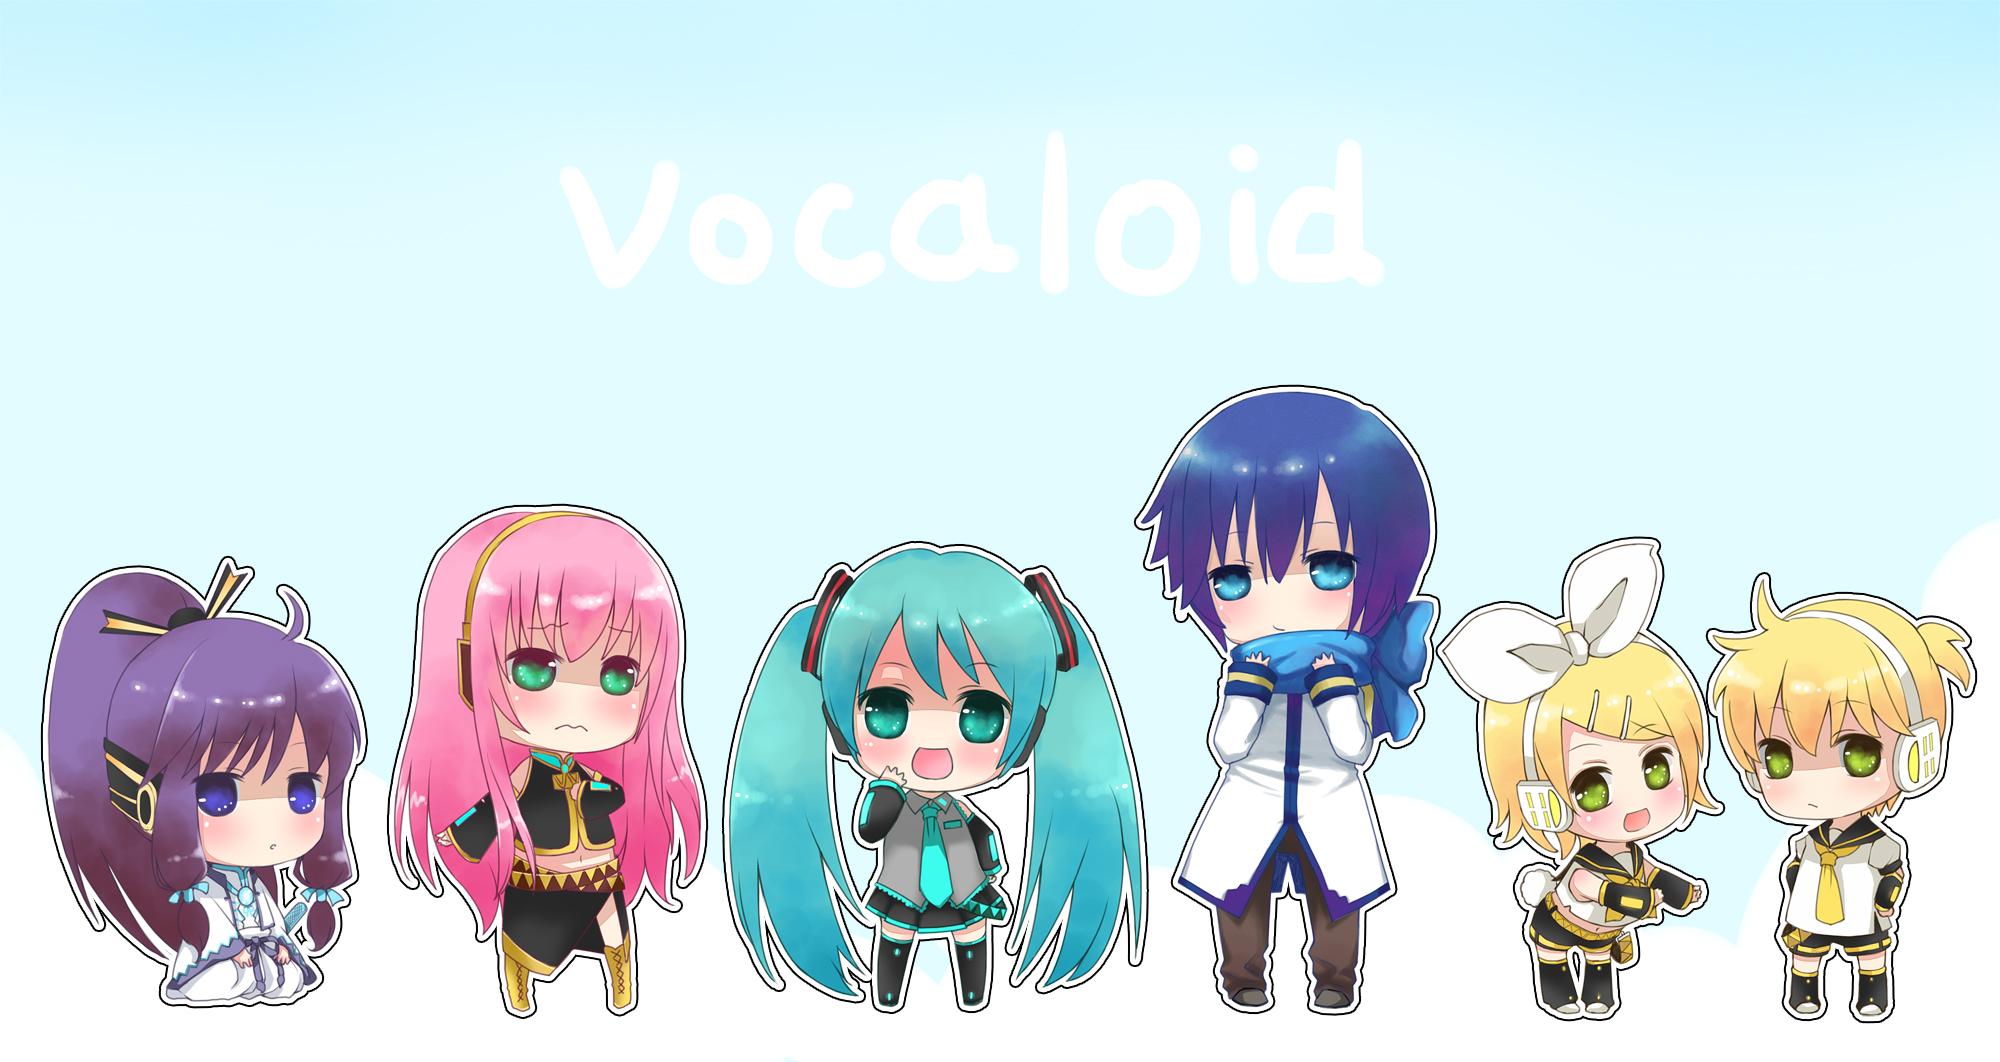 Vocaloid Chibi Group Wallpaper Chibi Group Wallpaper ...